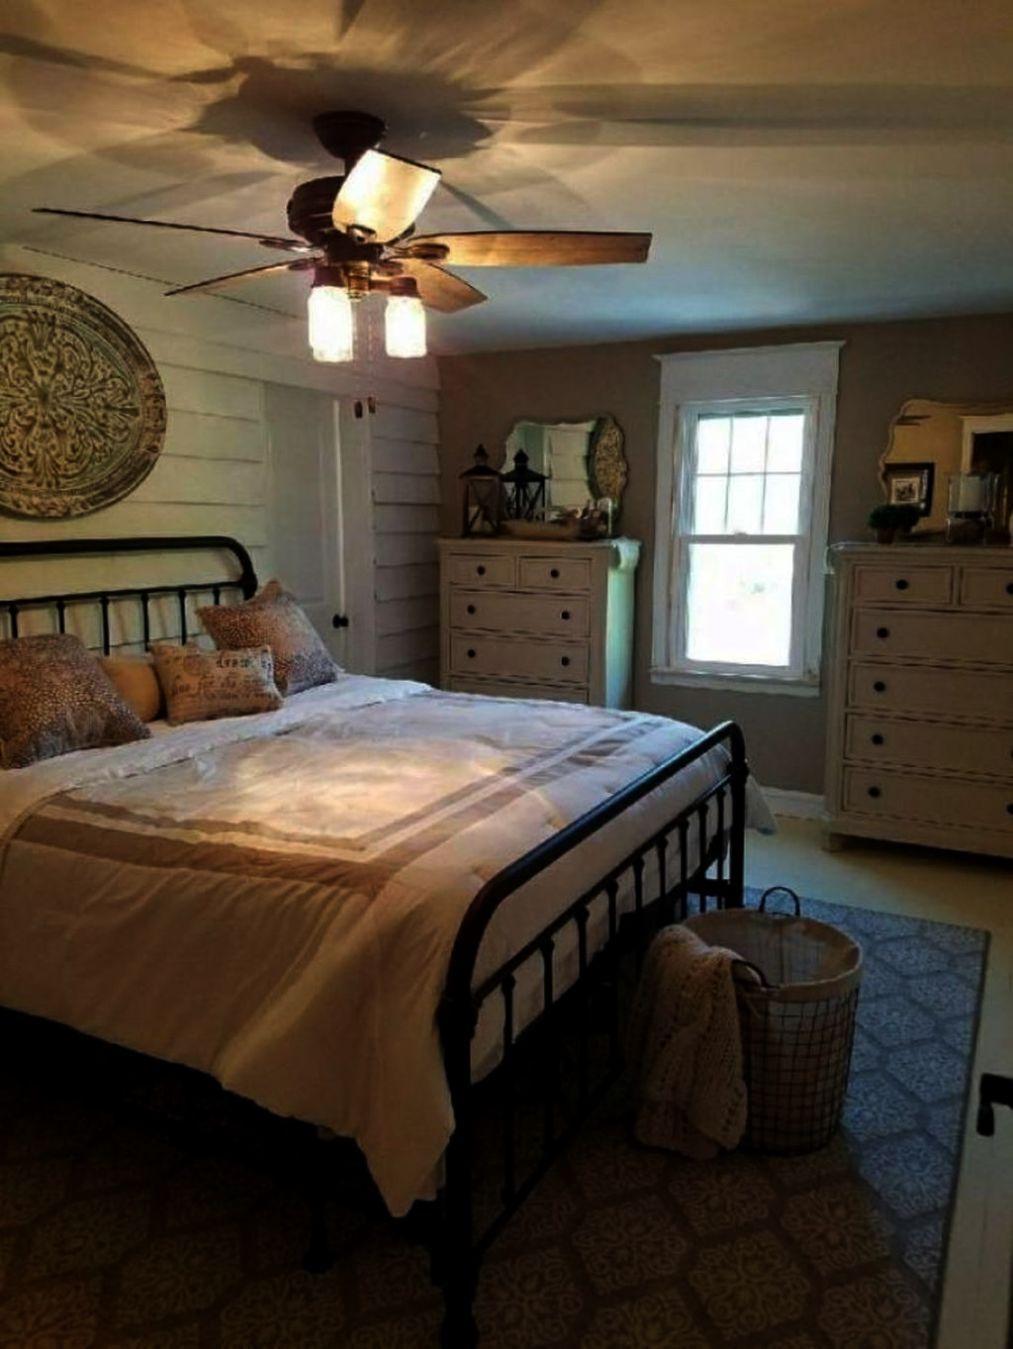 Bedroom Furniture For Sale Aberdeen next Furniture Rental